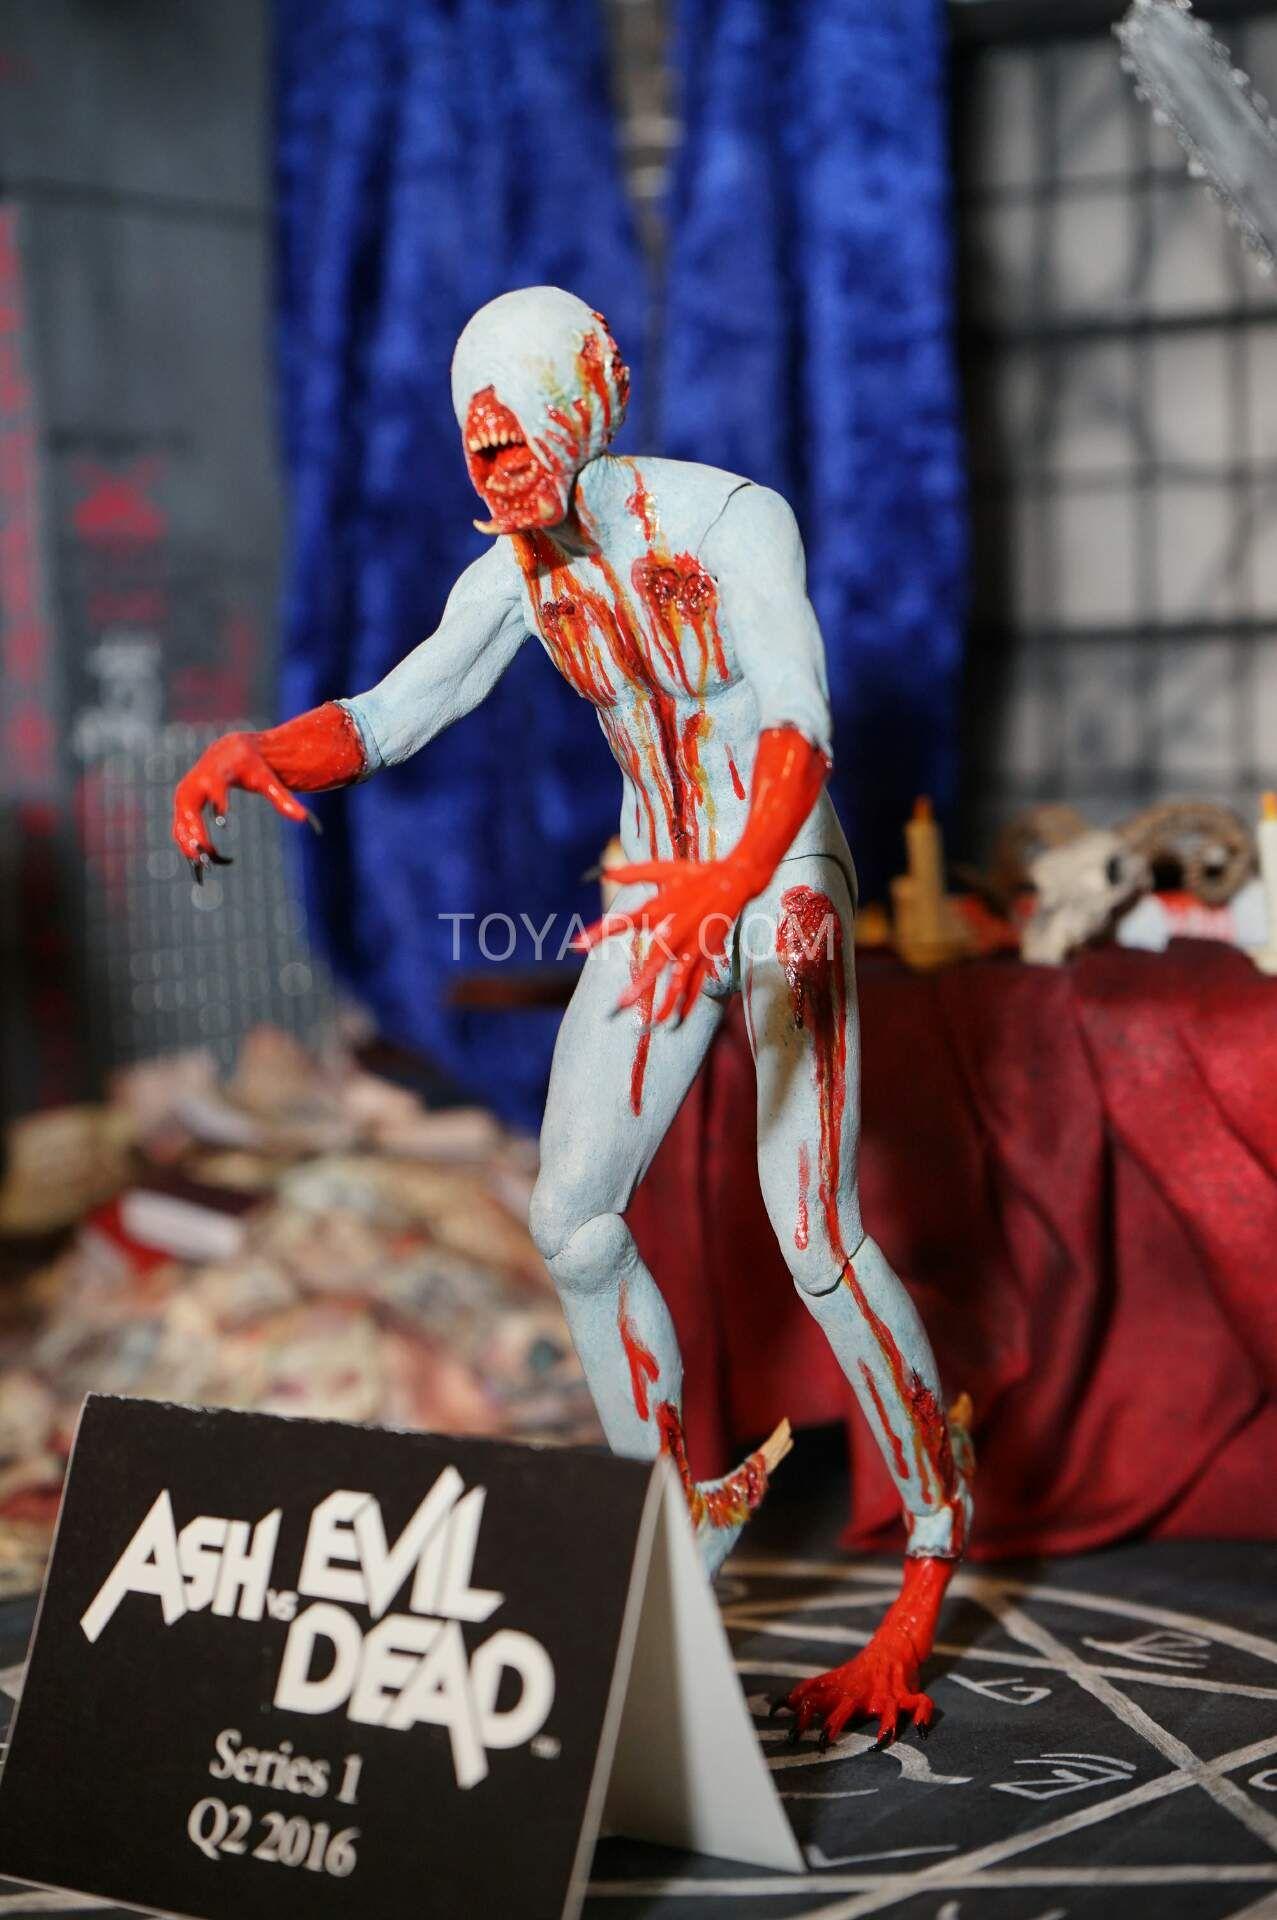 http://news.toyark.com/wp-content/uploads/sites/4/2016/02/TF-2016-NECA-Ash-vs-Evil-Dead-003.jpg